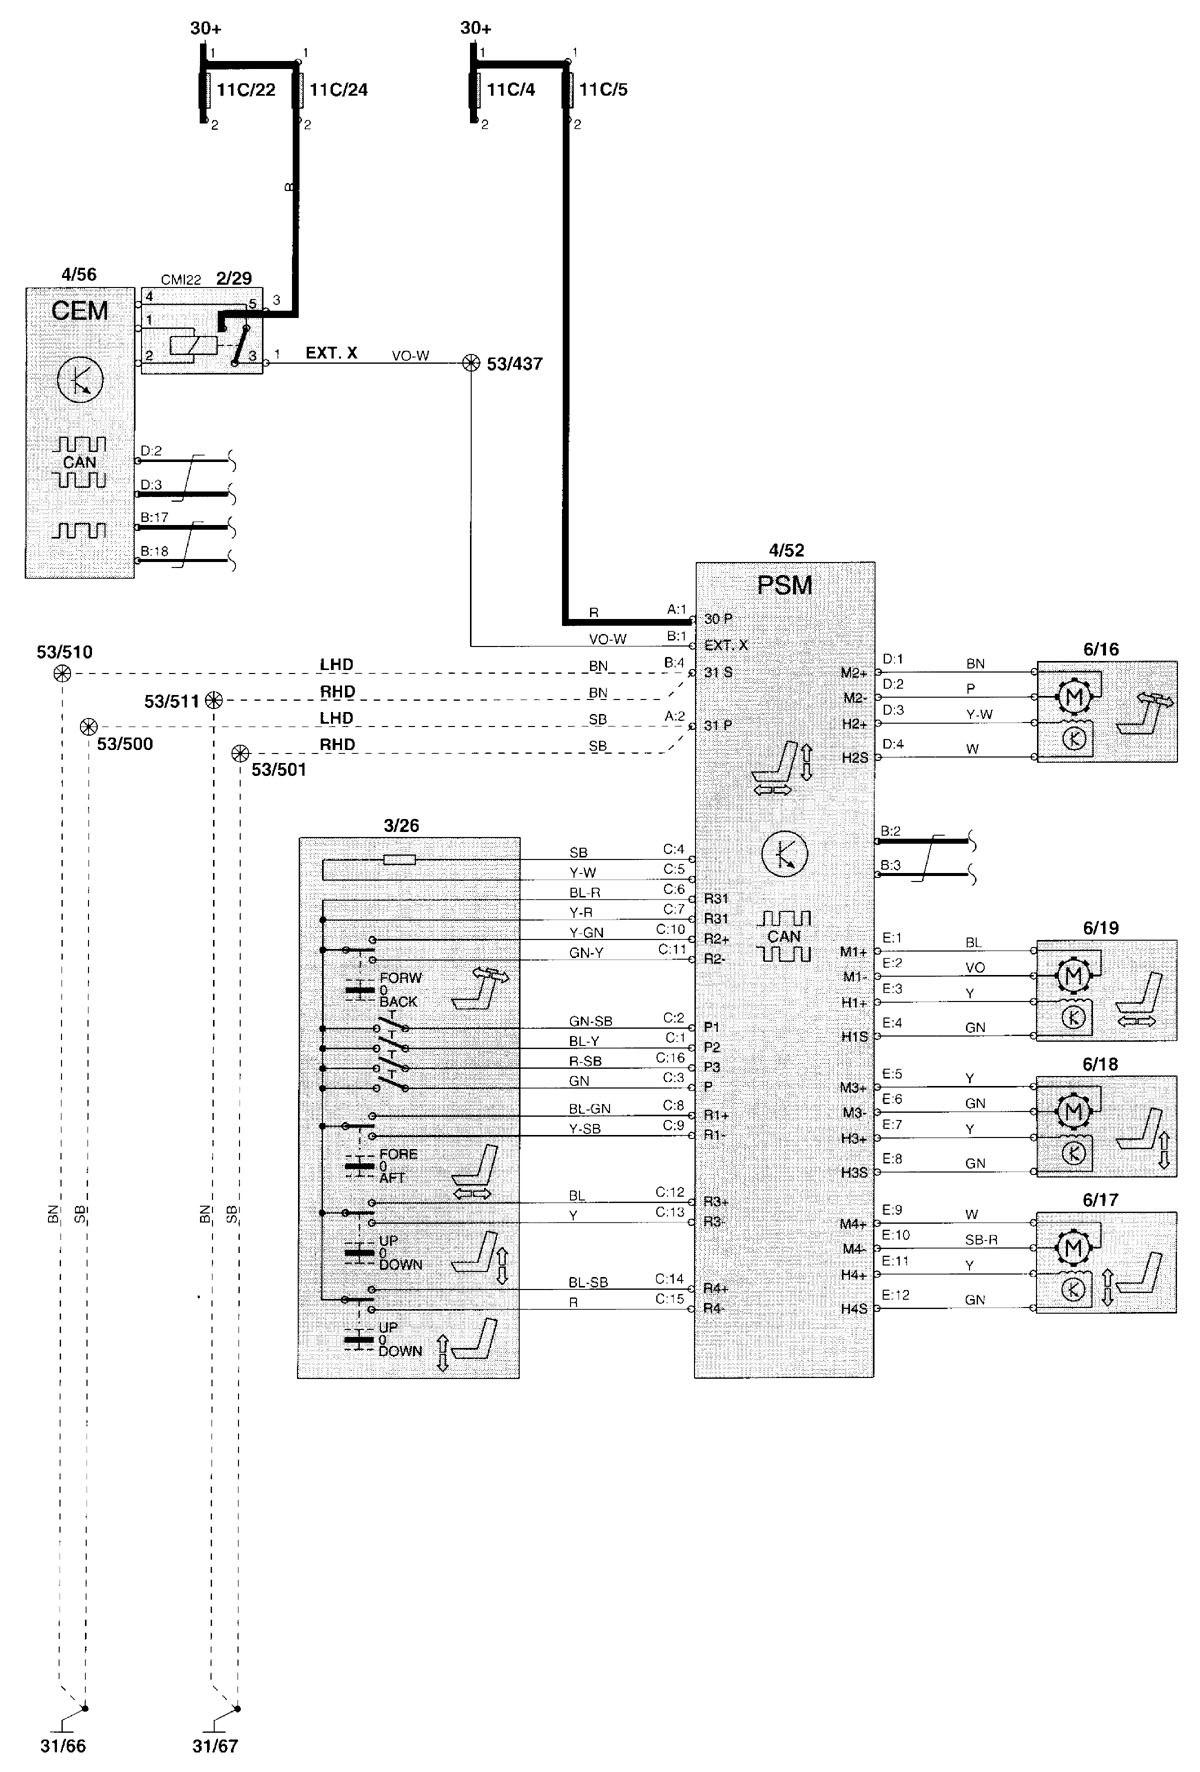 [NRIO_4796]   AZ_5061] Volvo Wiring Diagram Xc70 | 2002 Volvo Wiring Diagrams |  | Taliz Unre Tivexi Eatte Mohammedshrine Librar Wiring 101